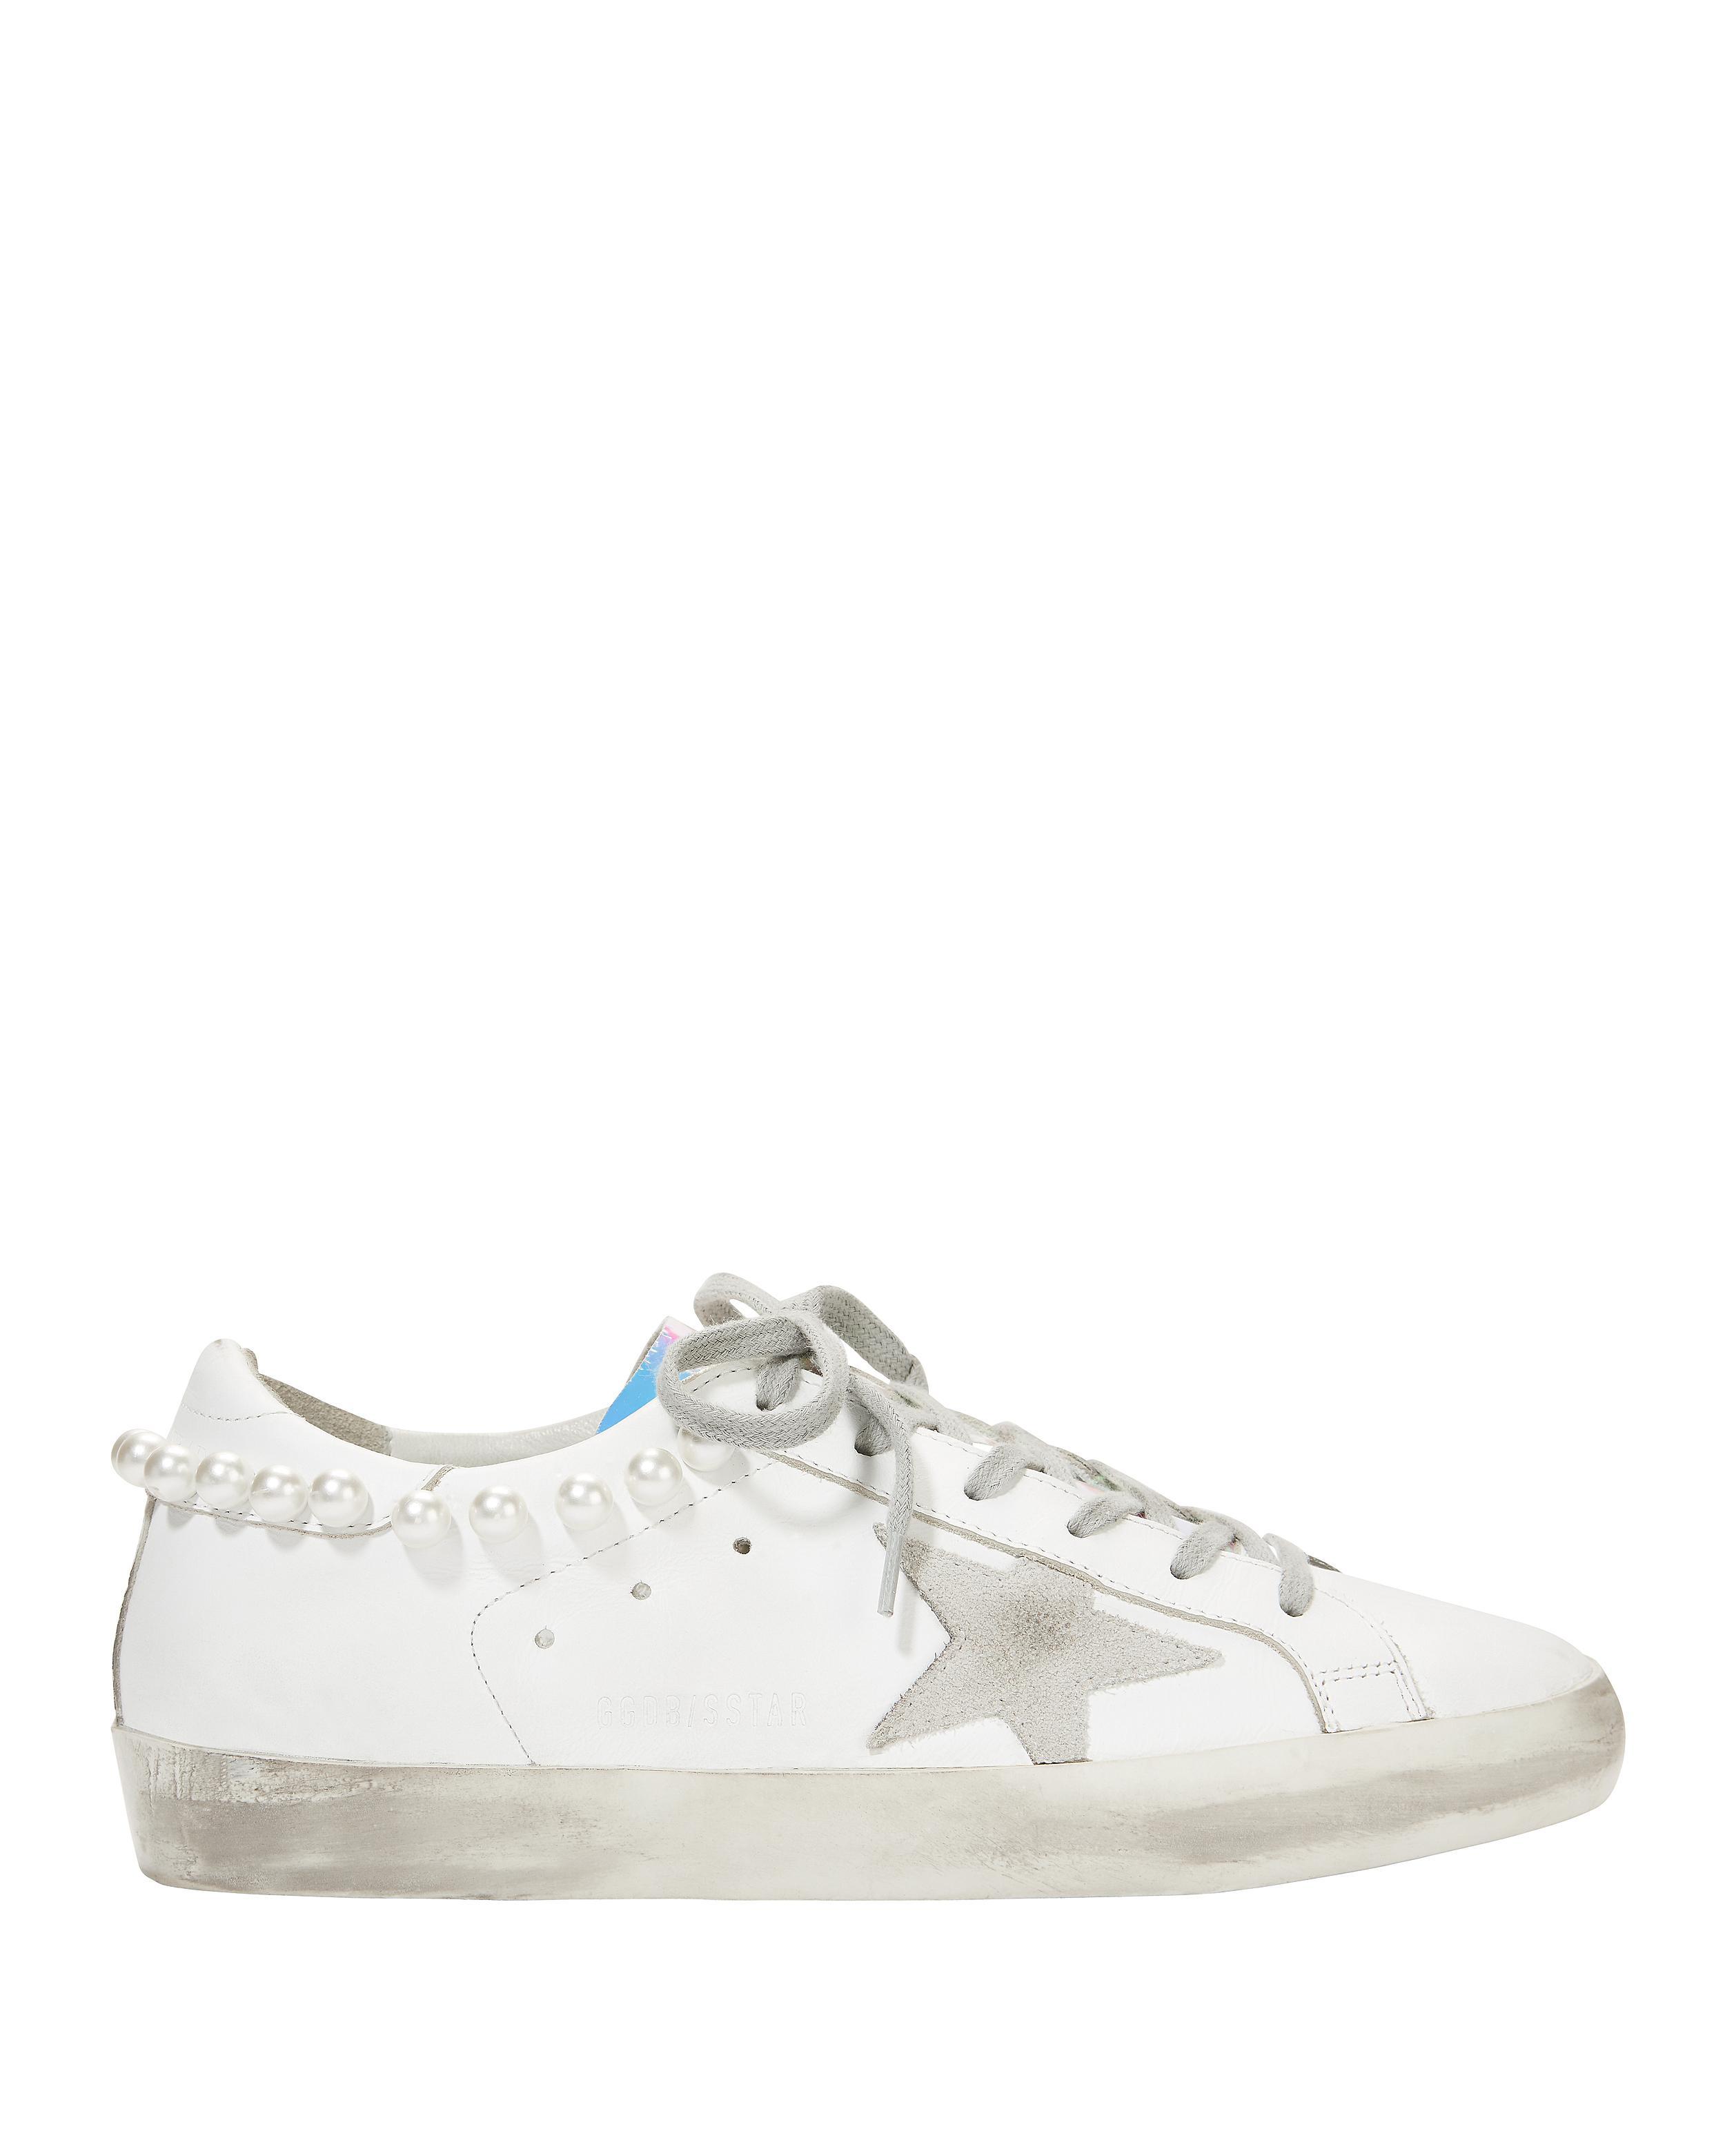 Golden Goose Deluxe Brand. Women's White Superstar Pearl Hologram Sneakers